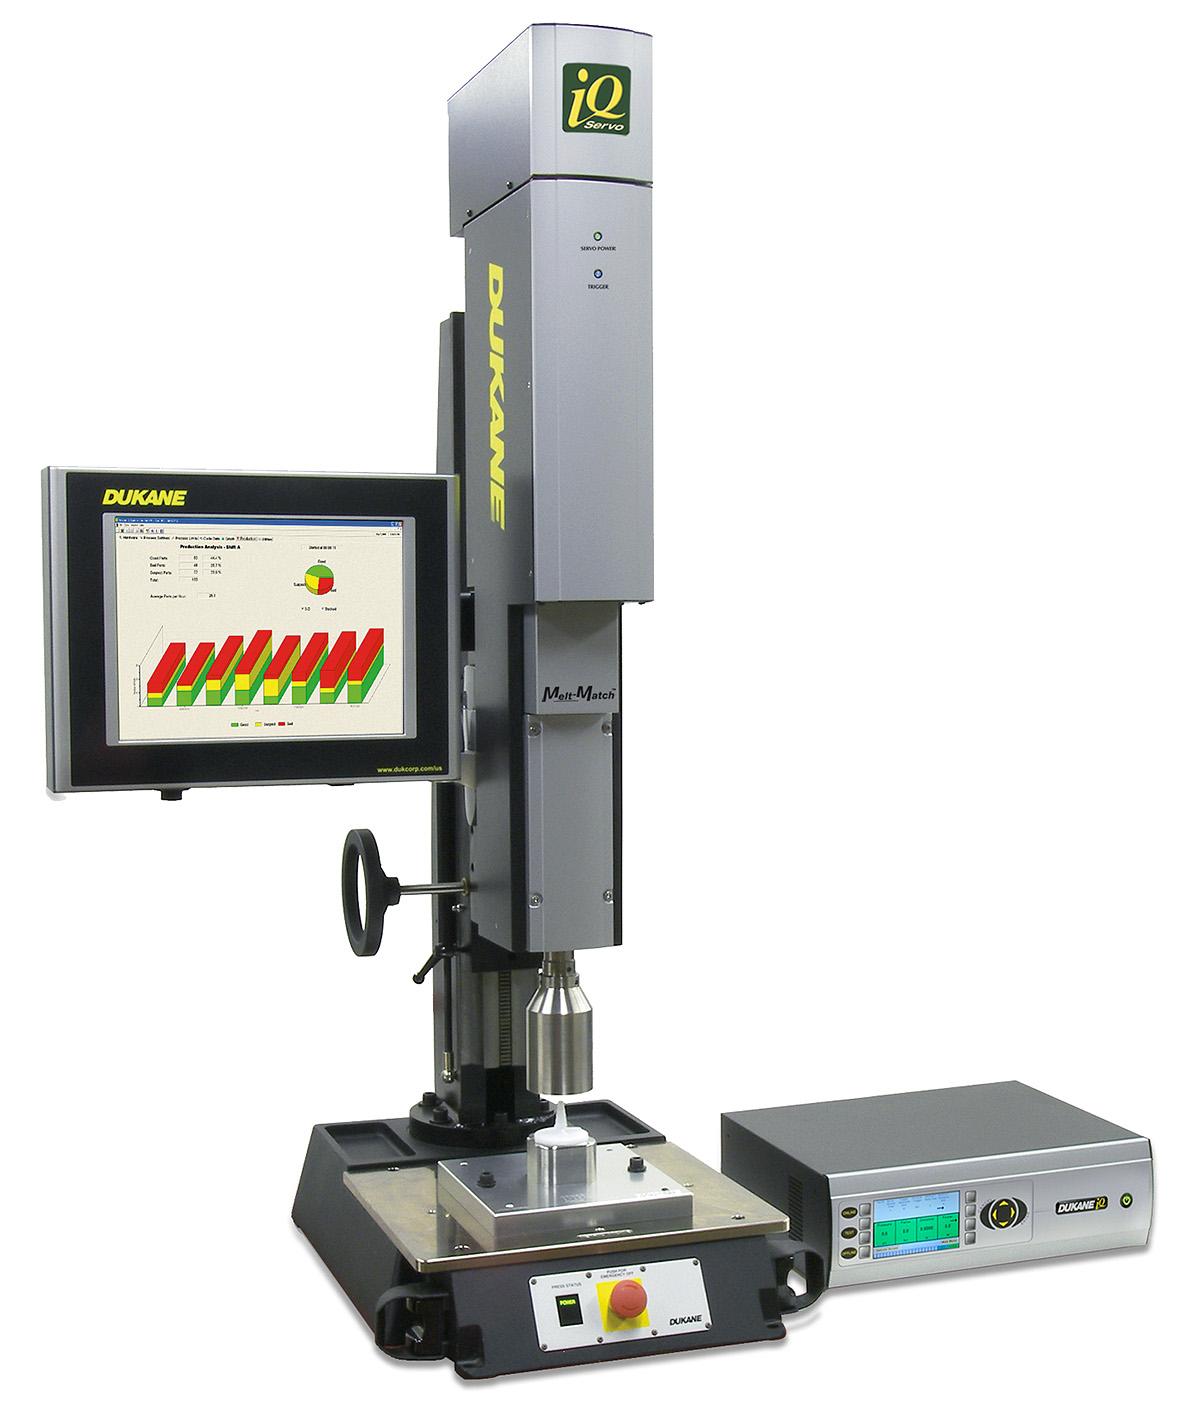 Dukane Ultrasonic Welding And Cutting Iq Servo Diagram Press